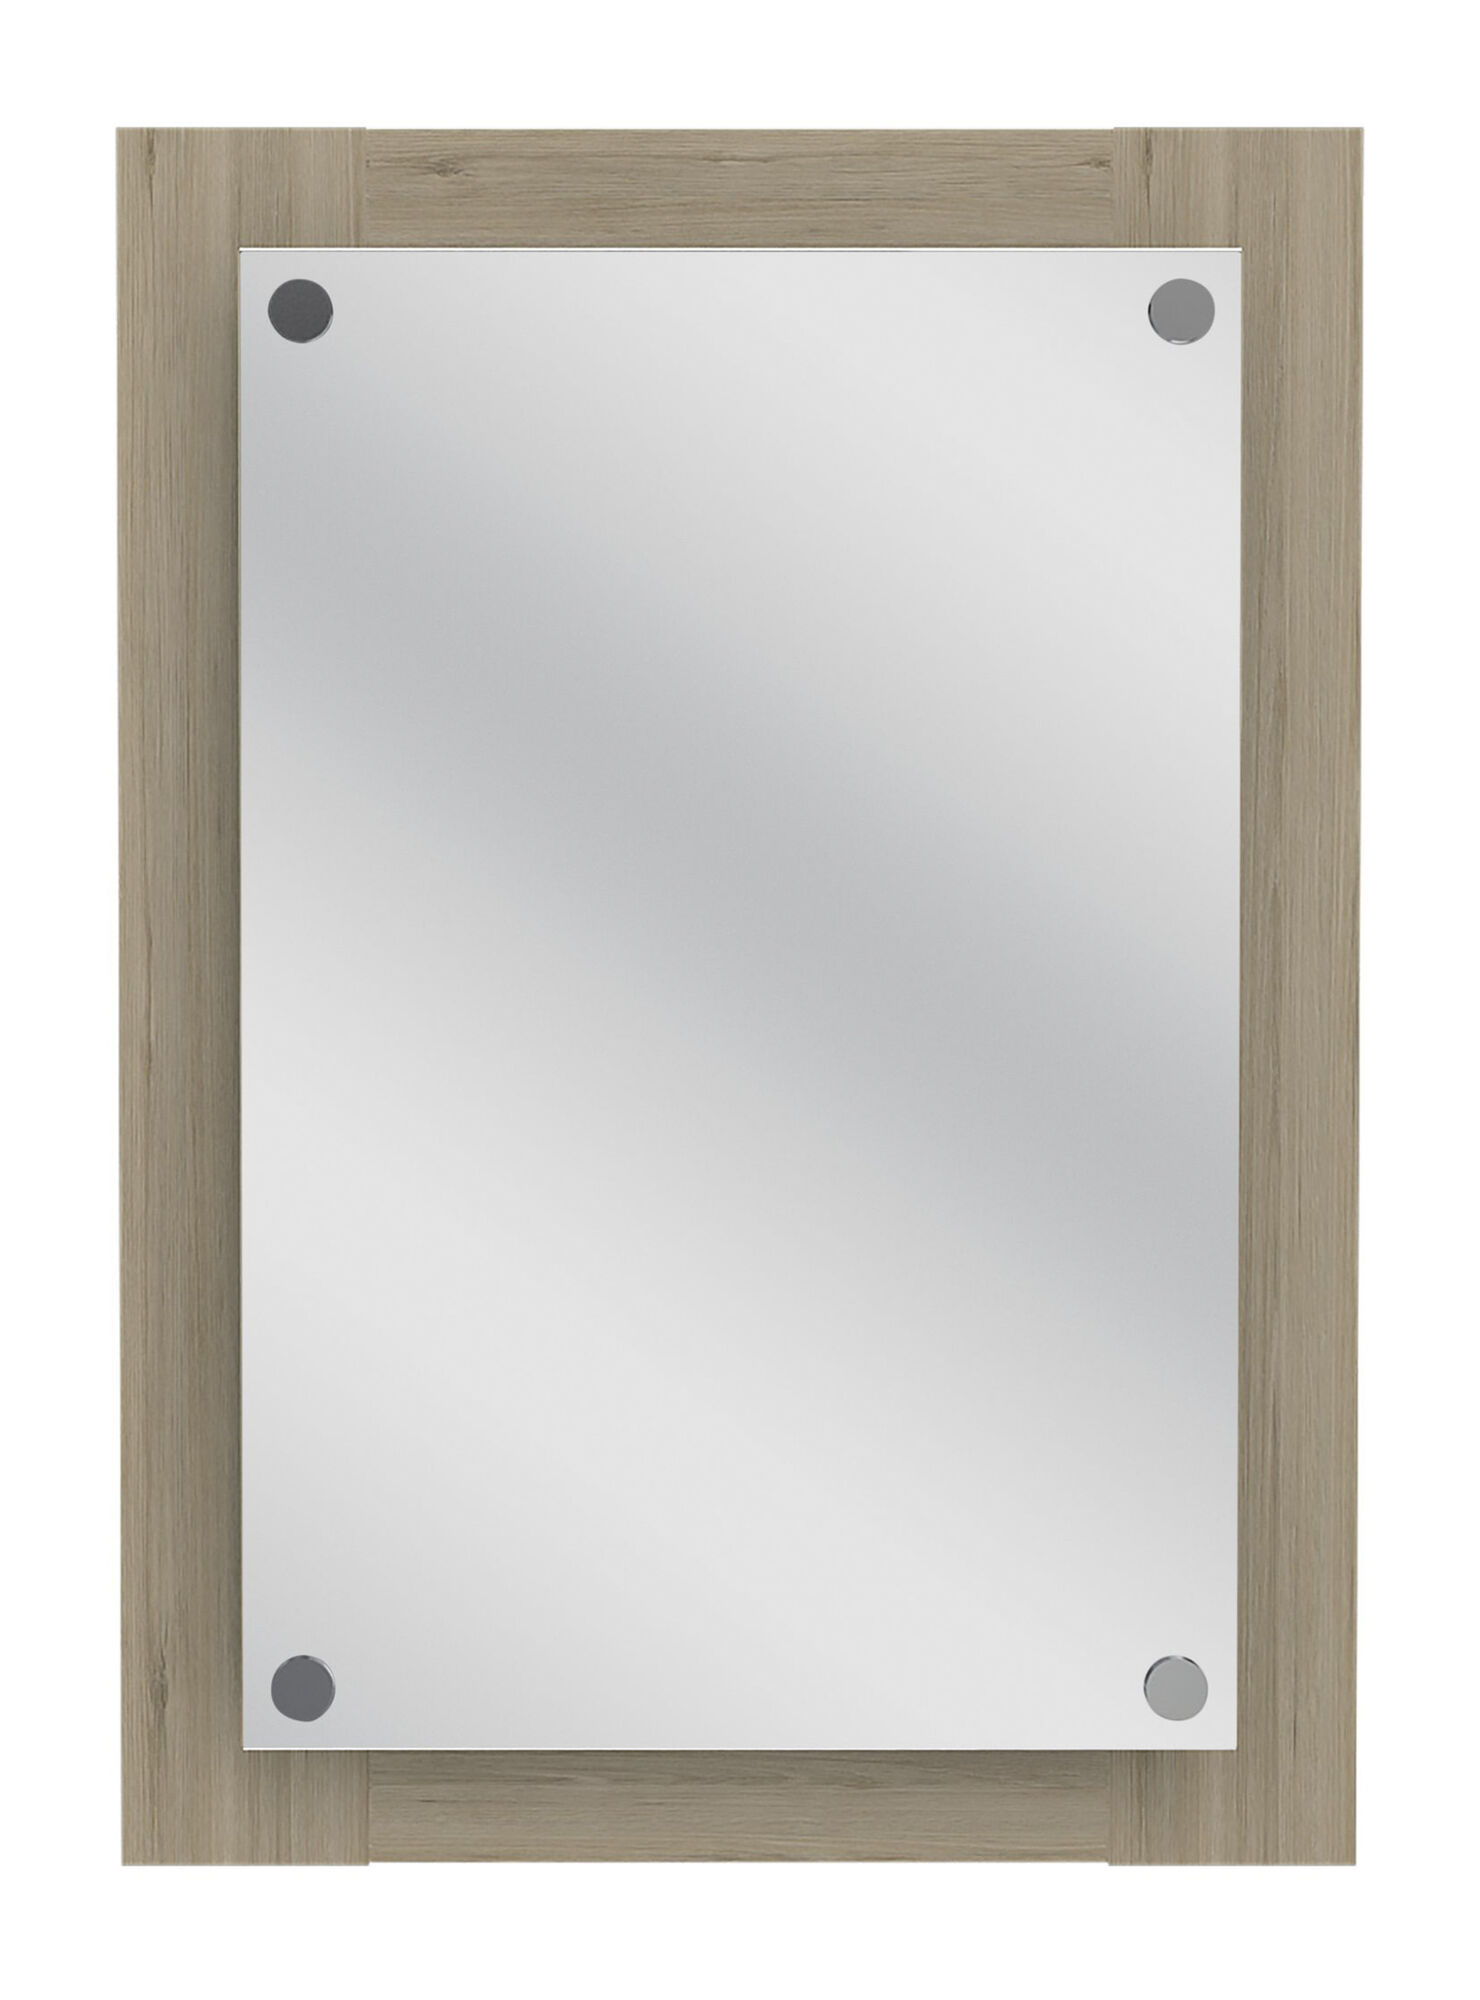 Espejo Bano.Espejo Para Bano Vanguard Tuhome